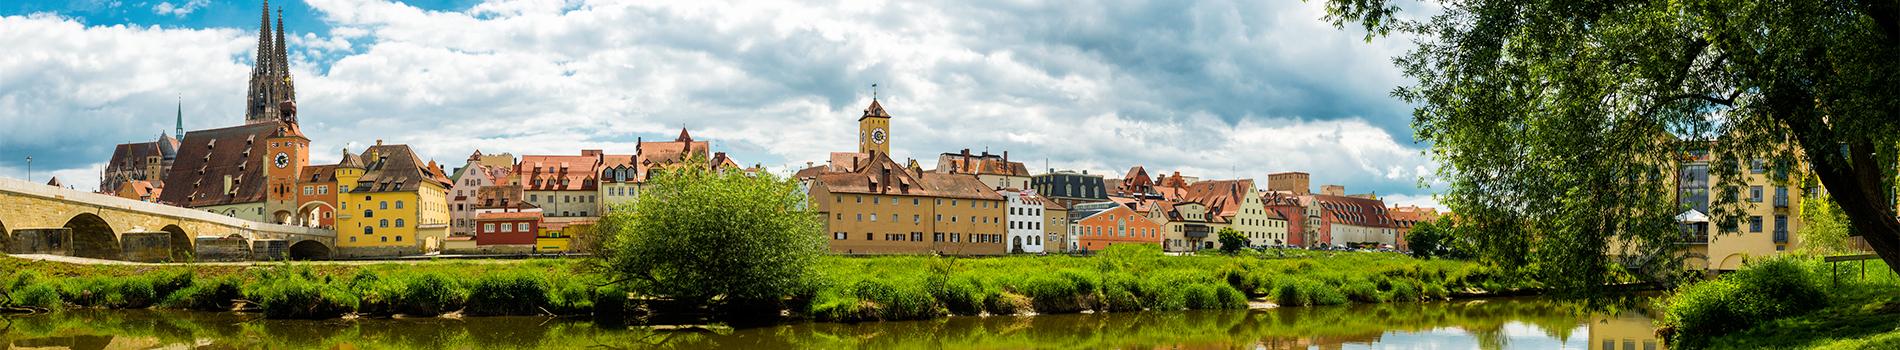 No Limit Regensburg